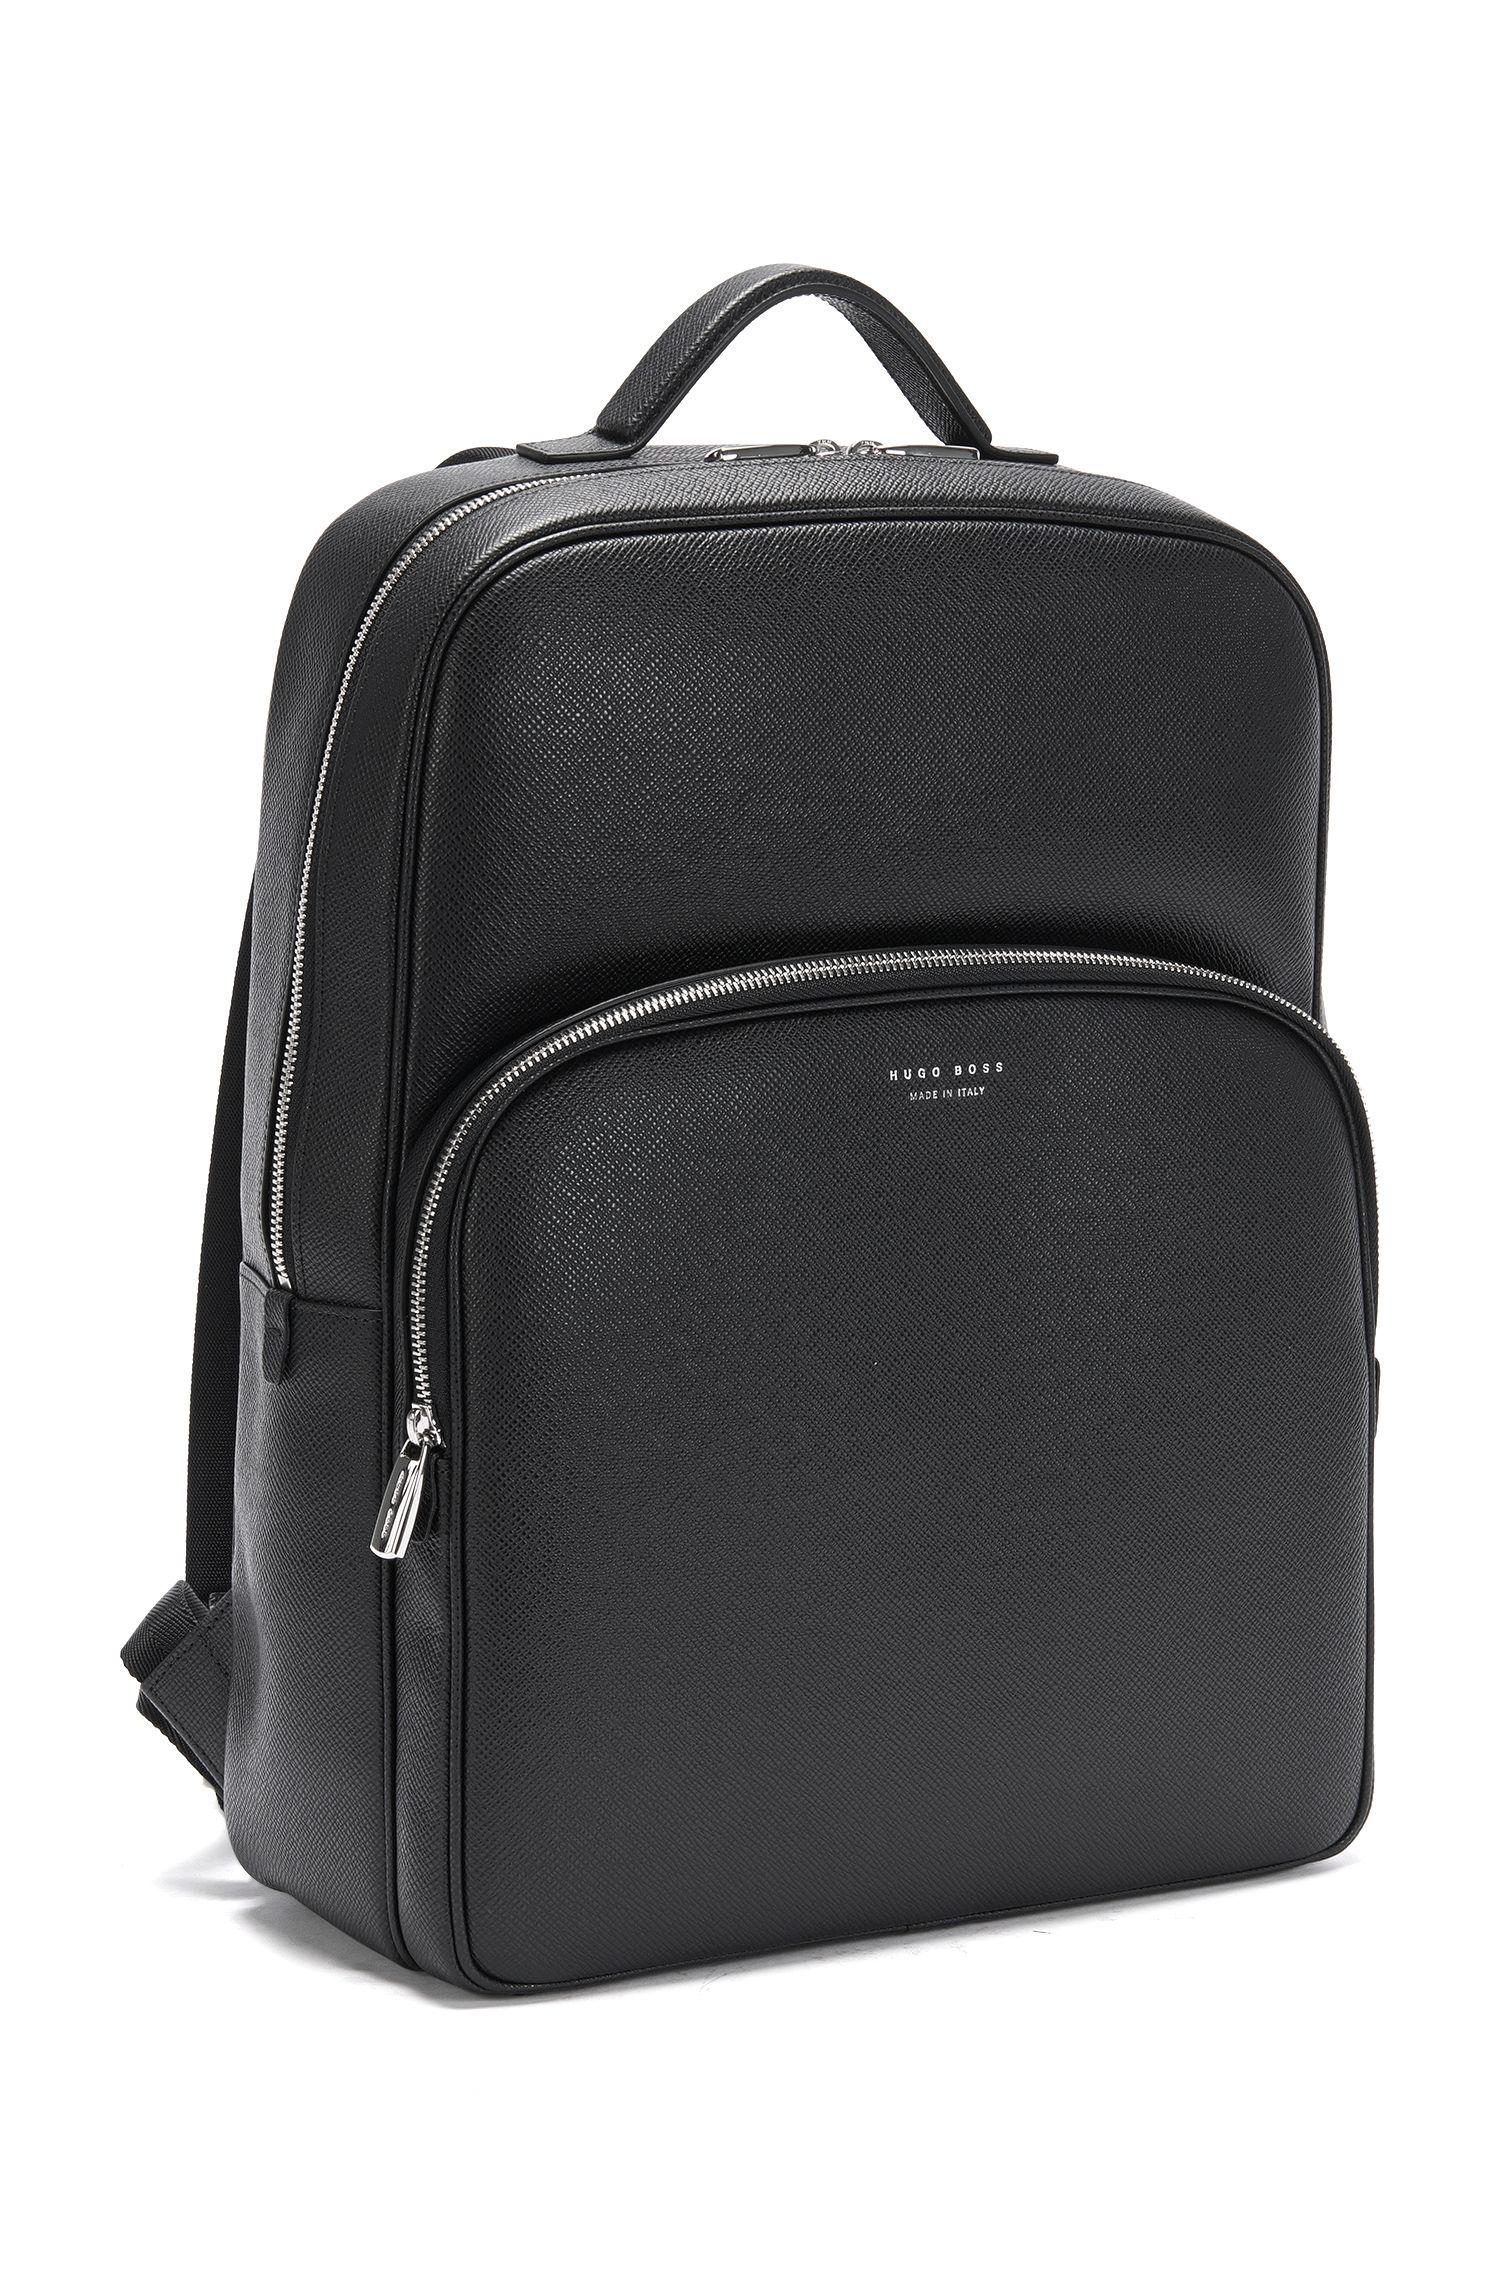 Calfskin Palmellato Backpack | Signature B Backpack